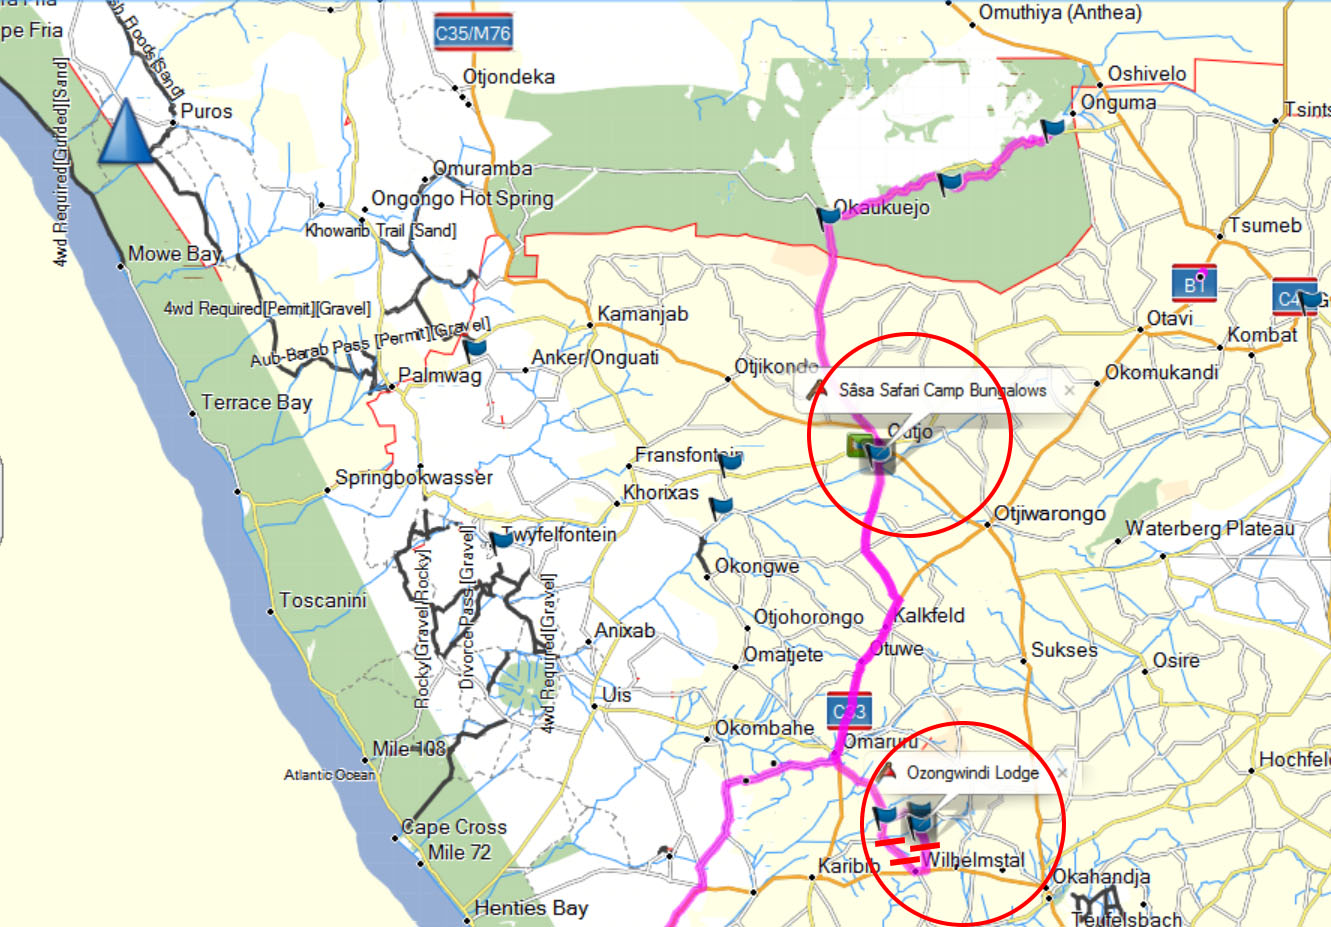 Streckenführung Halali, Sasa Safari Camp, Ozongwindi